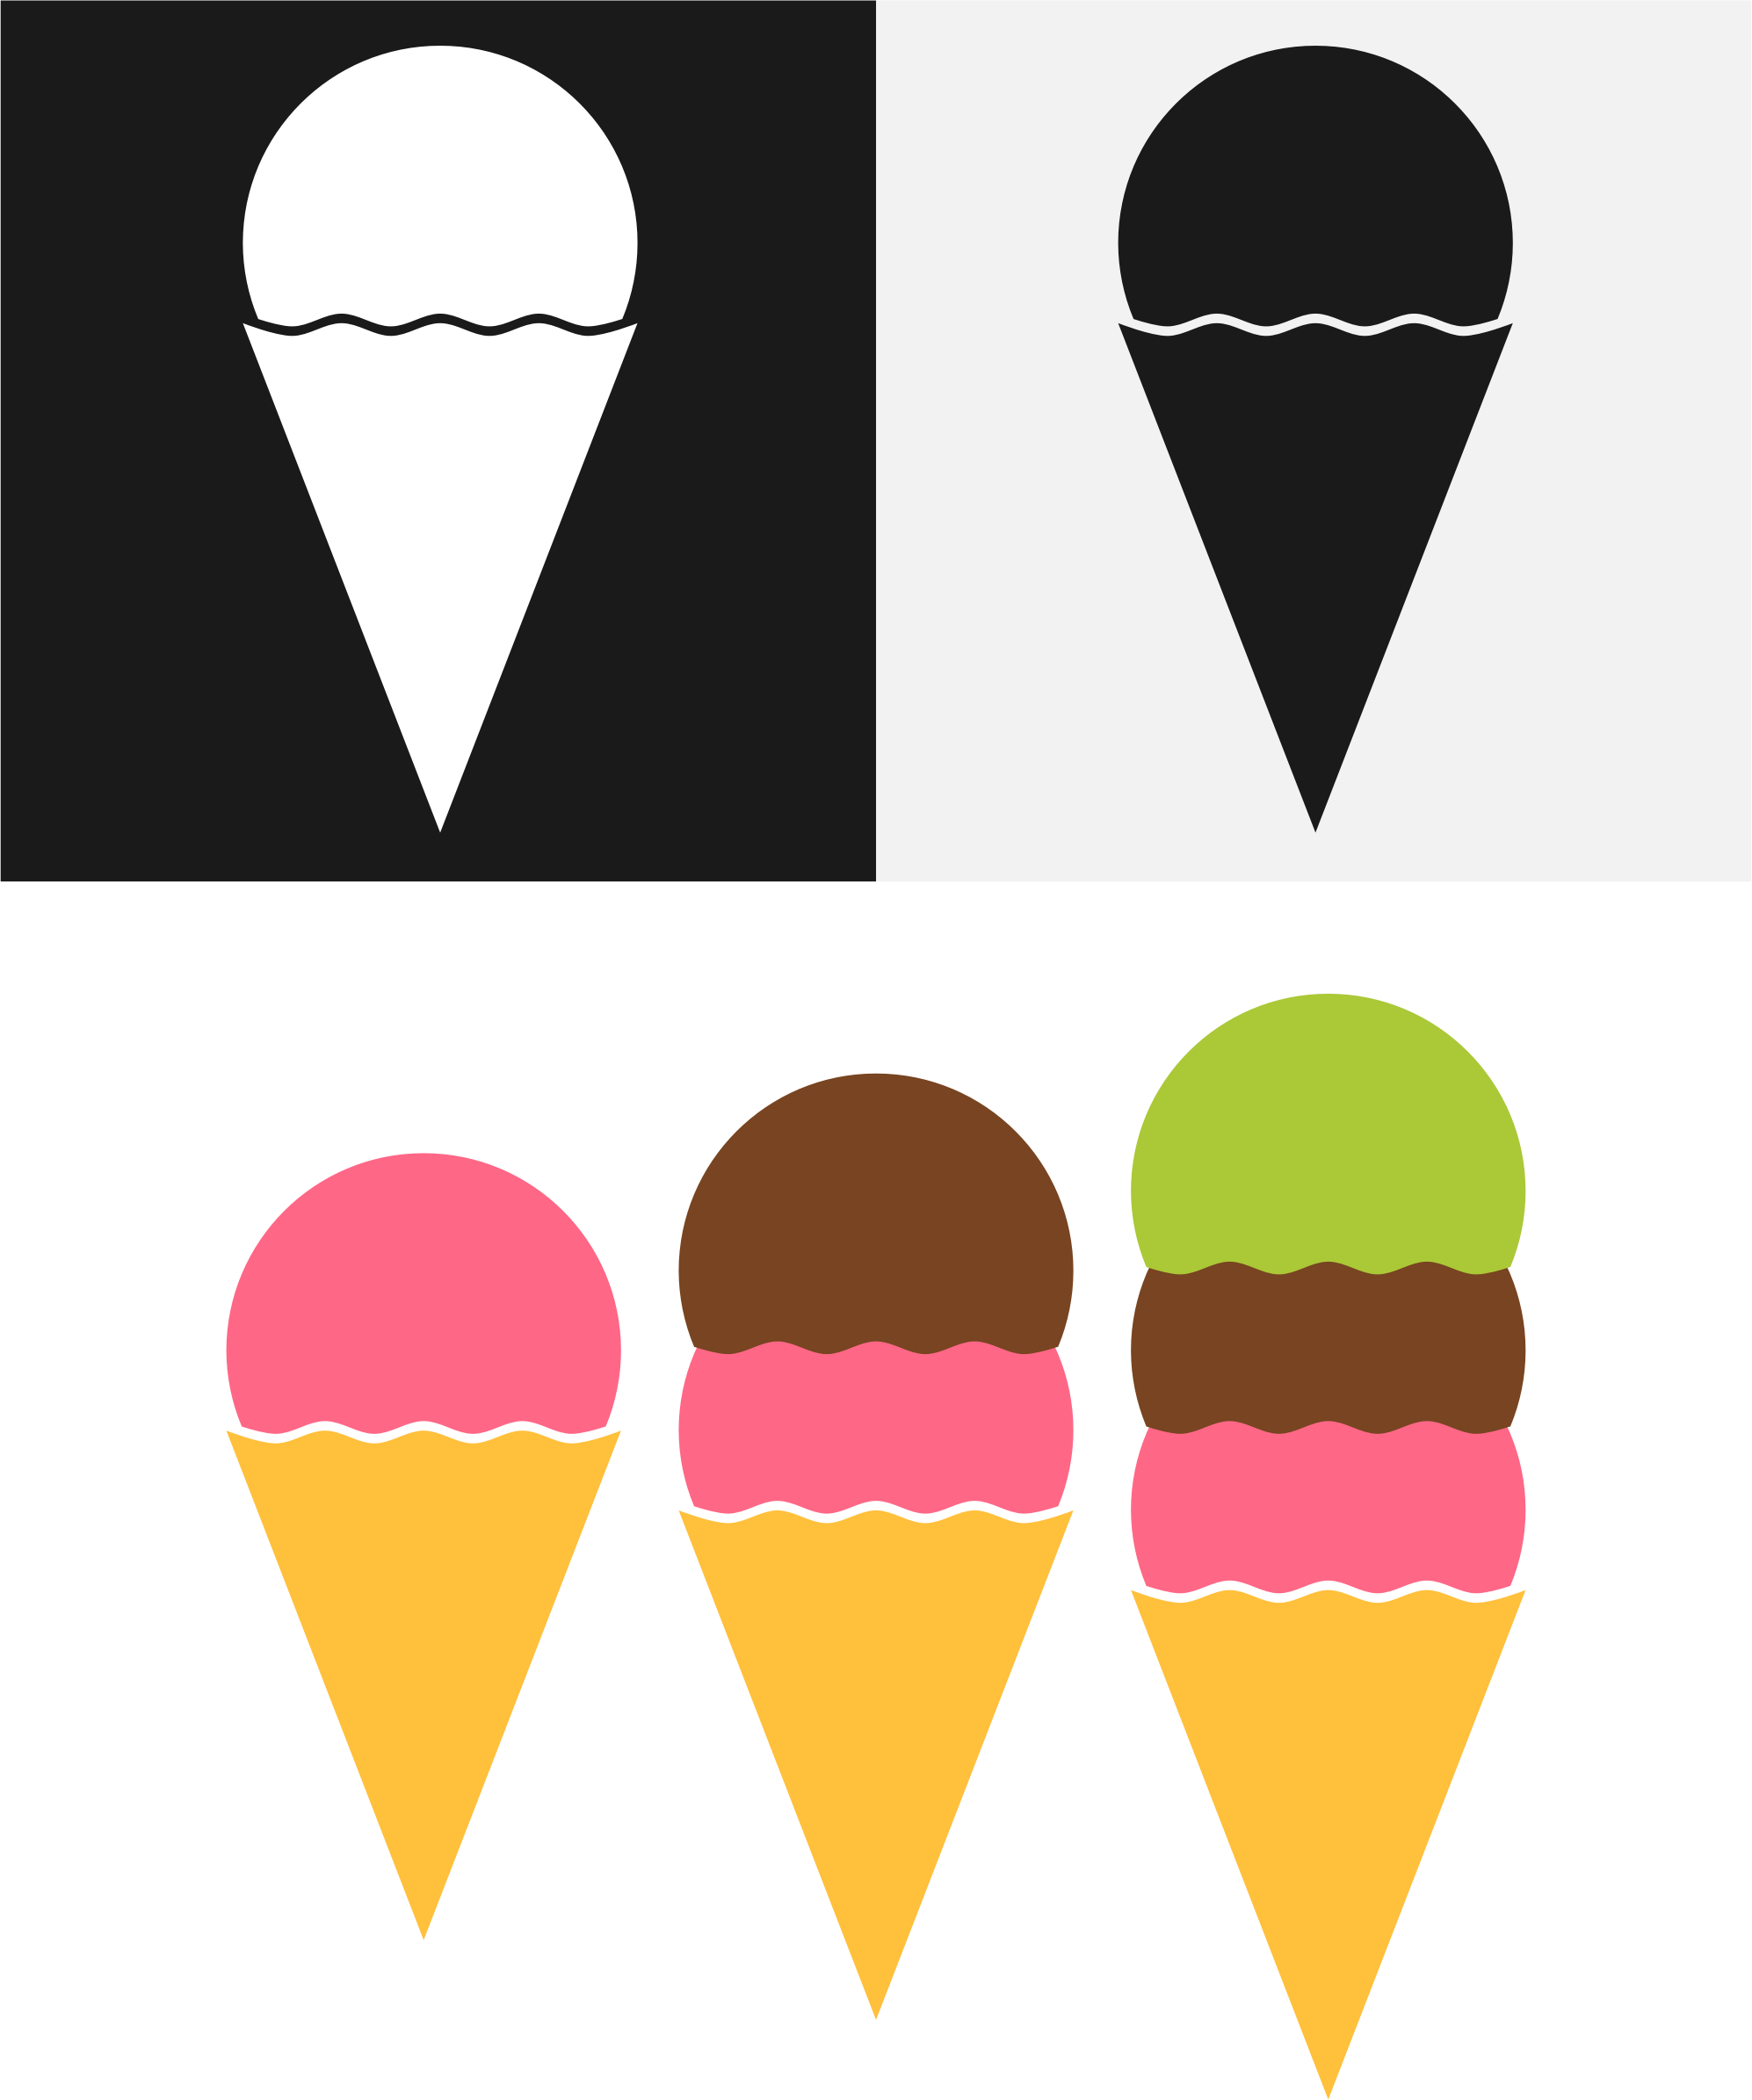 Cone yellow